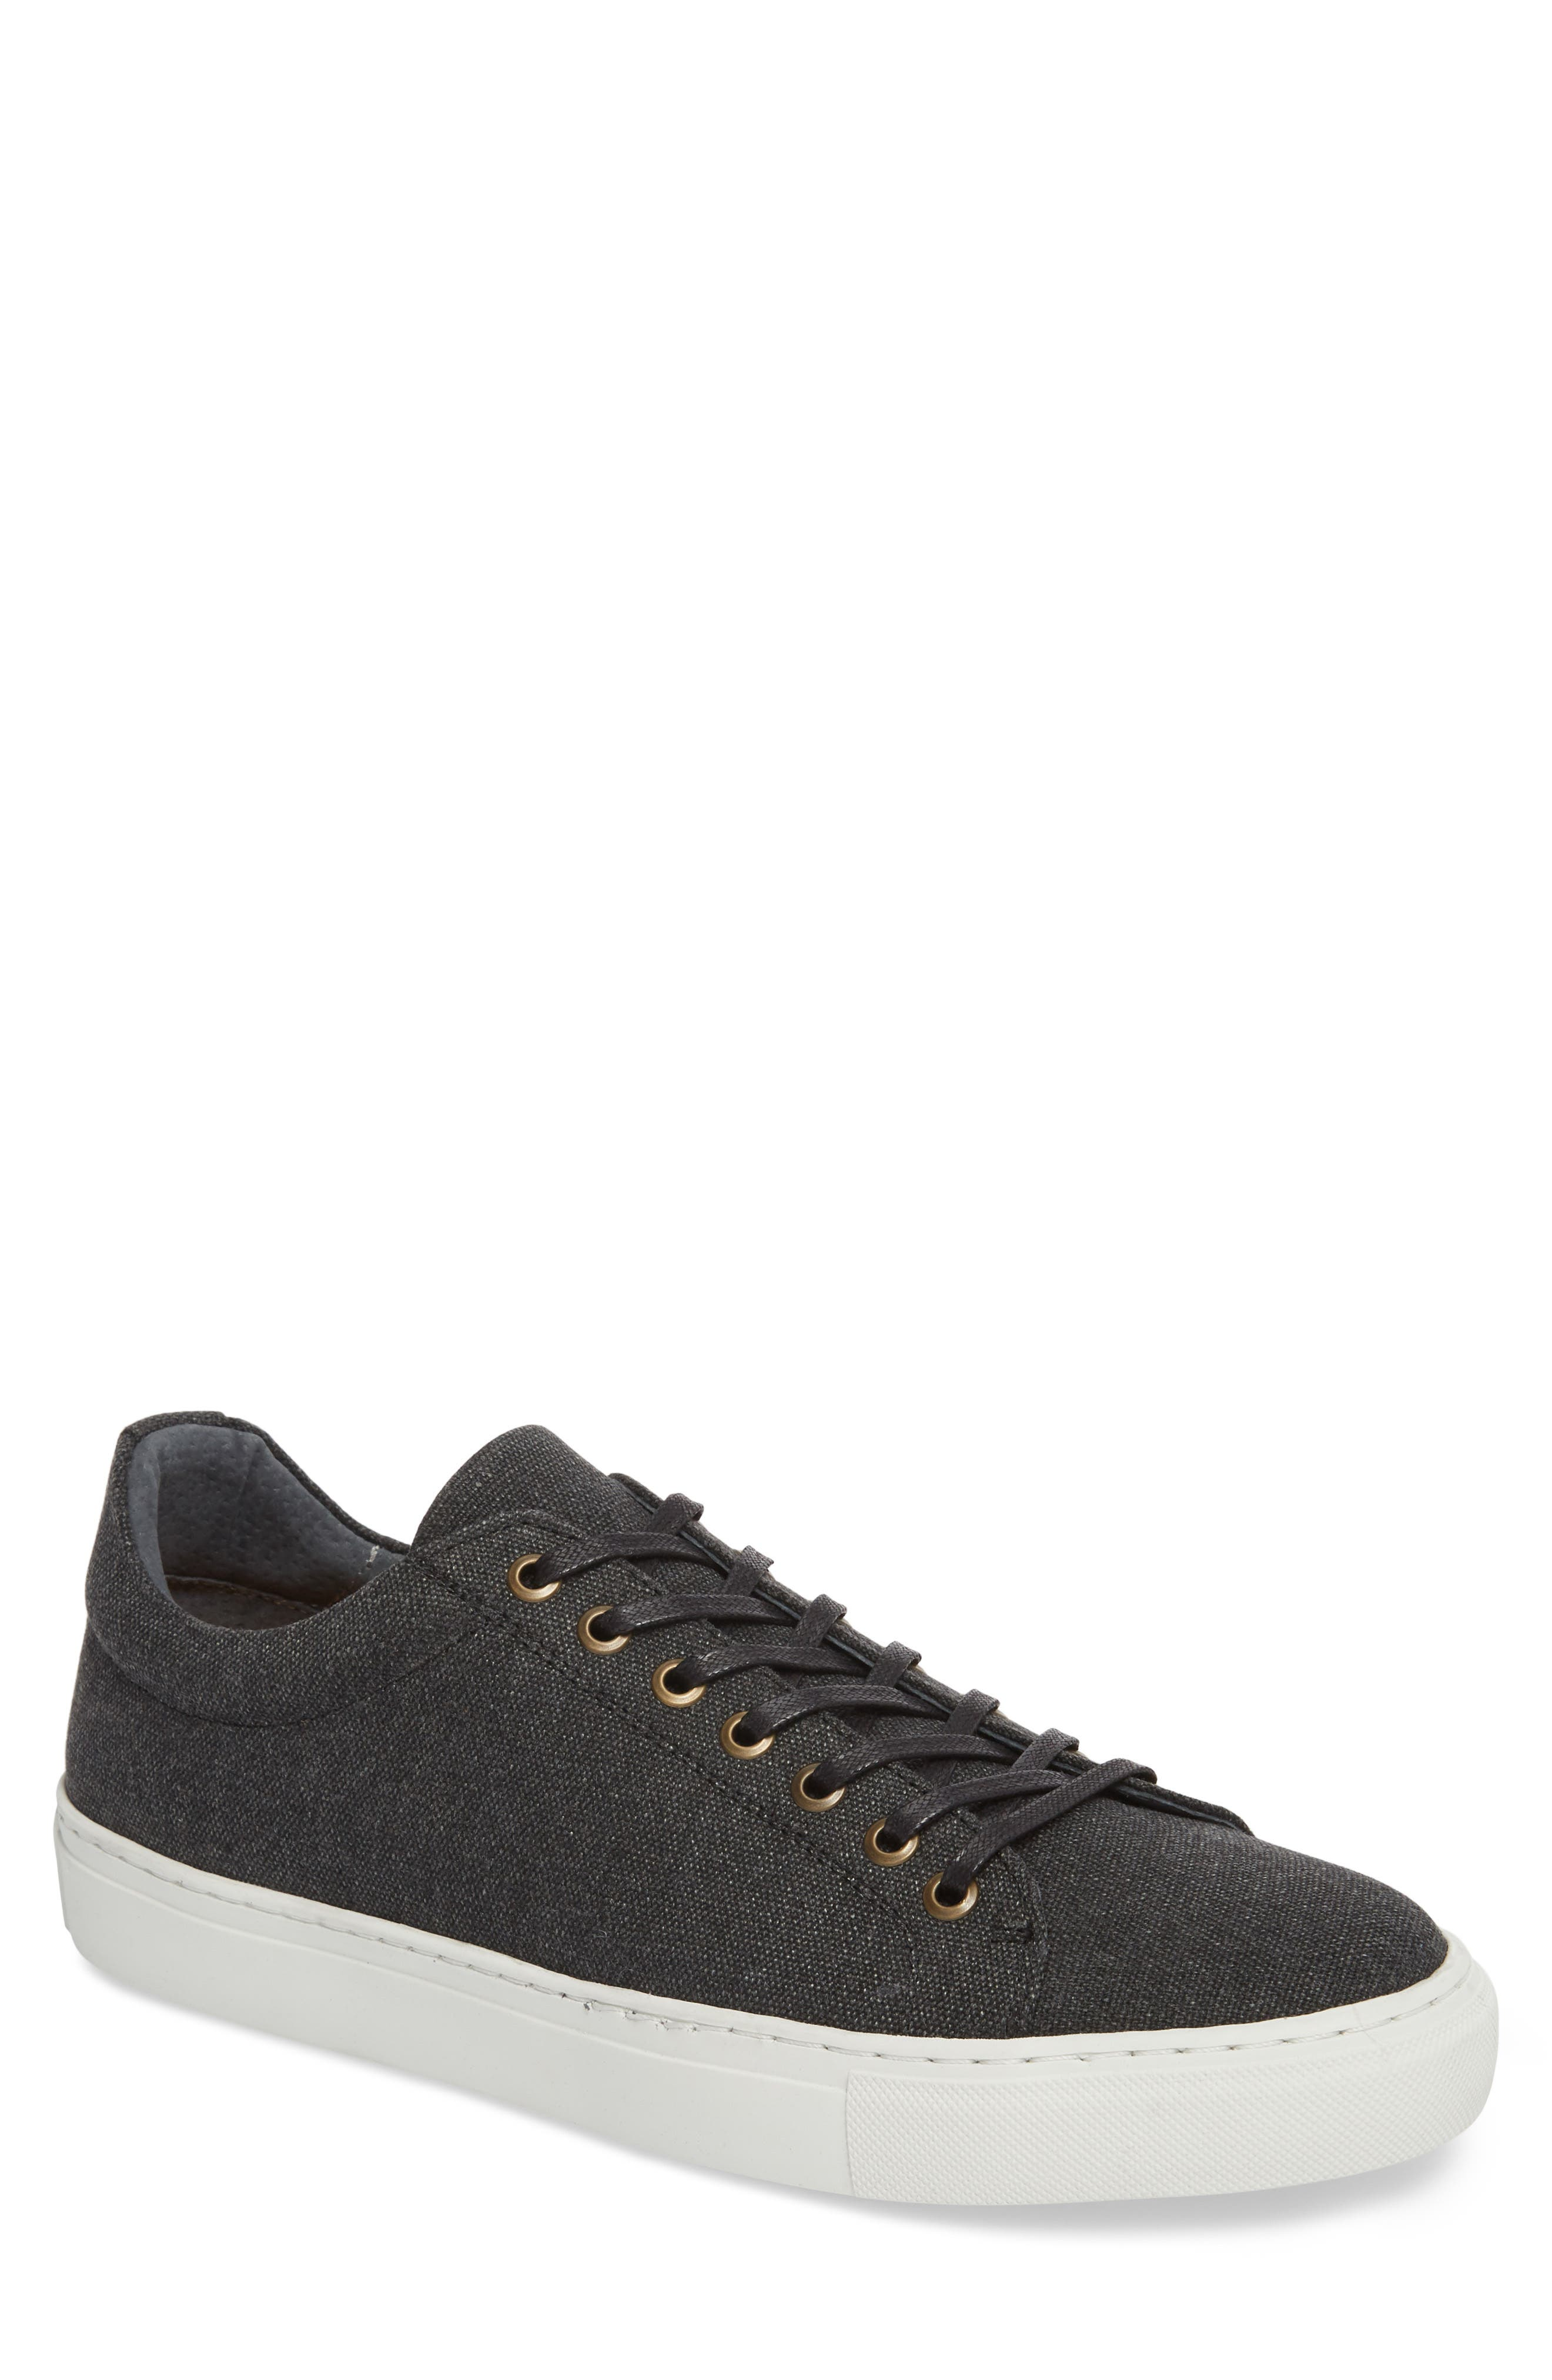 Mark Low Top Sneaker,                             Main thumbnail 1, color,                             Black Canvas